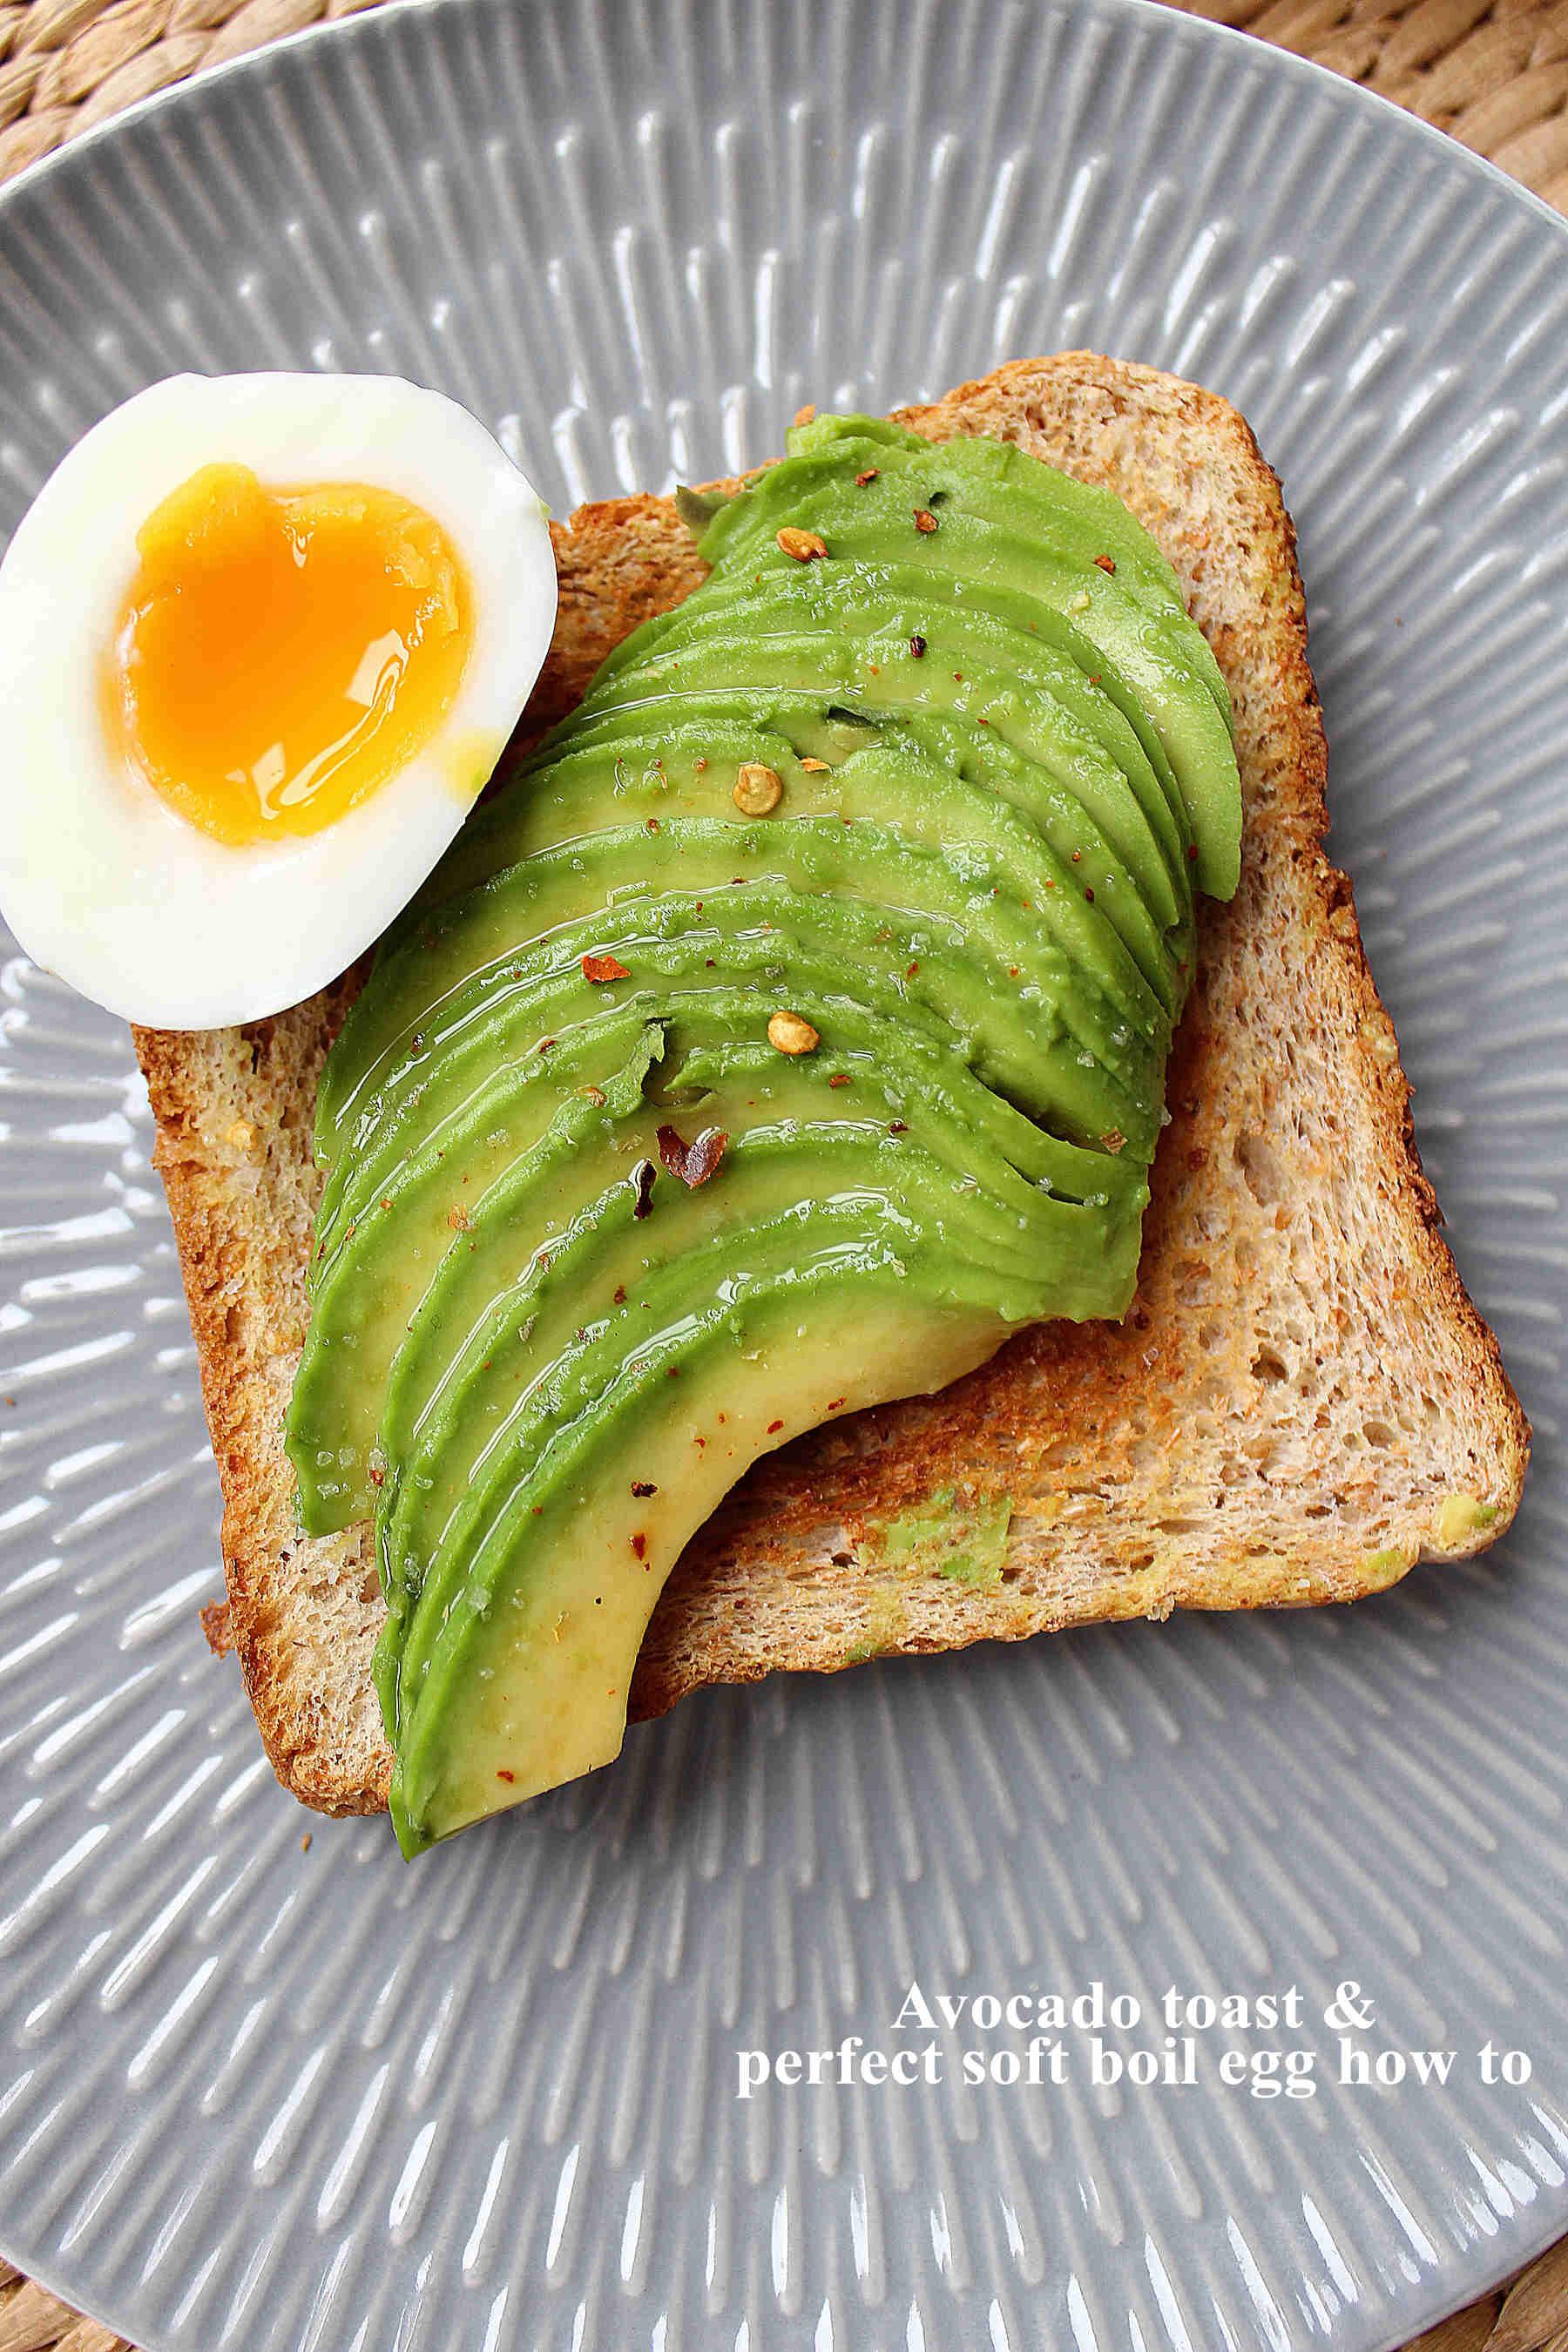 Avocado toast + foolproof soft boiled eggs